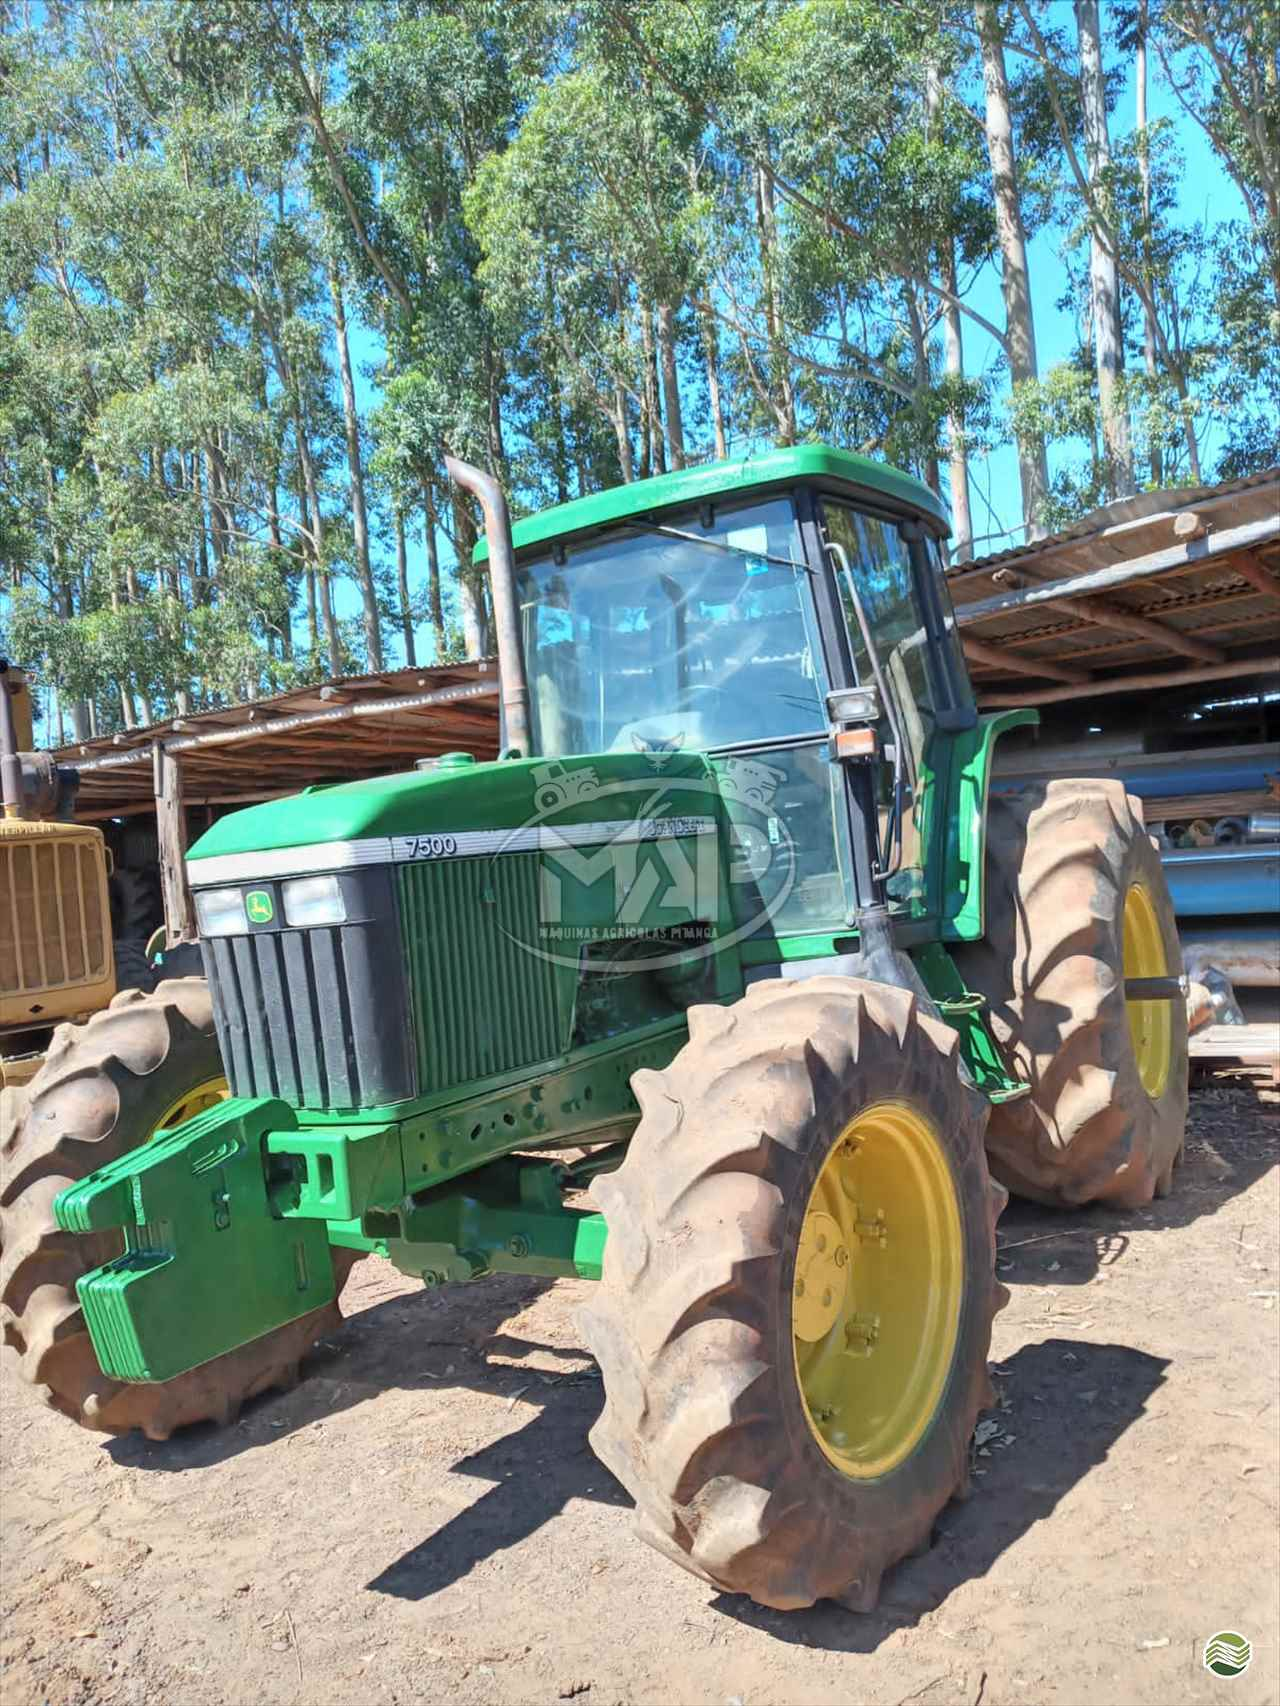 TRATOR JOHN DEERE JOHN DEERE 7500 Tração 4x4 Máquinas Agrícolas Pitanga PITANGA PARANÁ PR